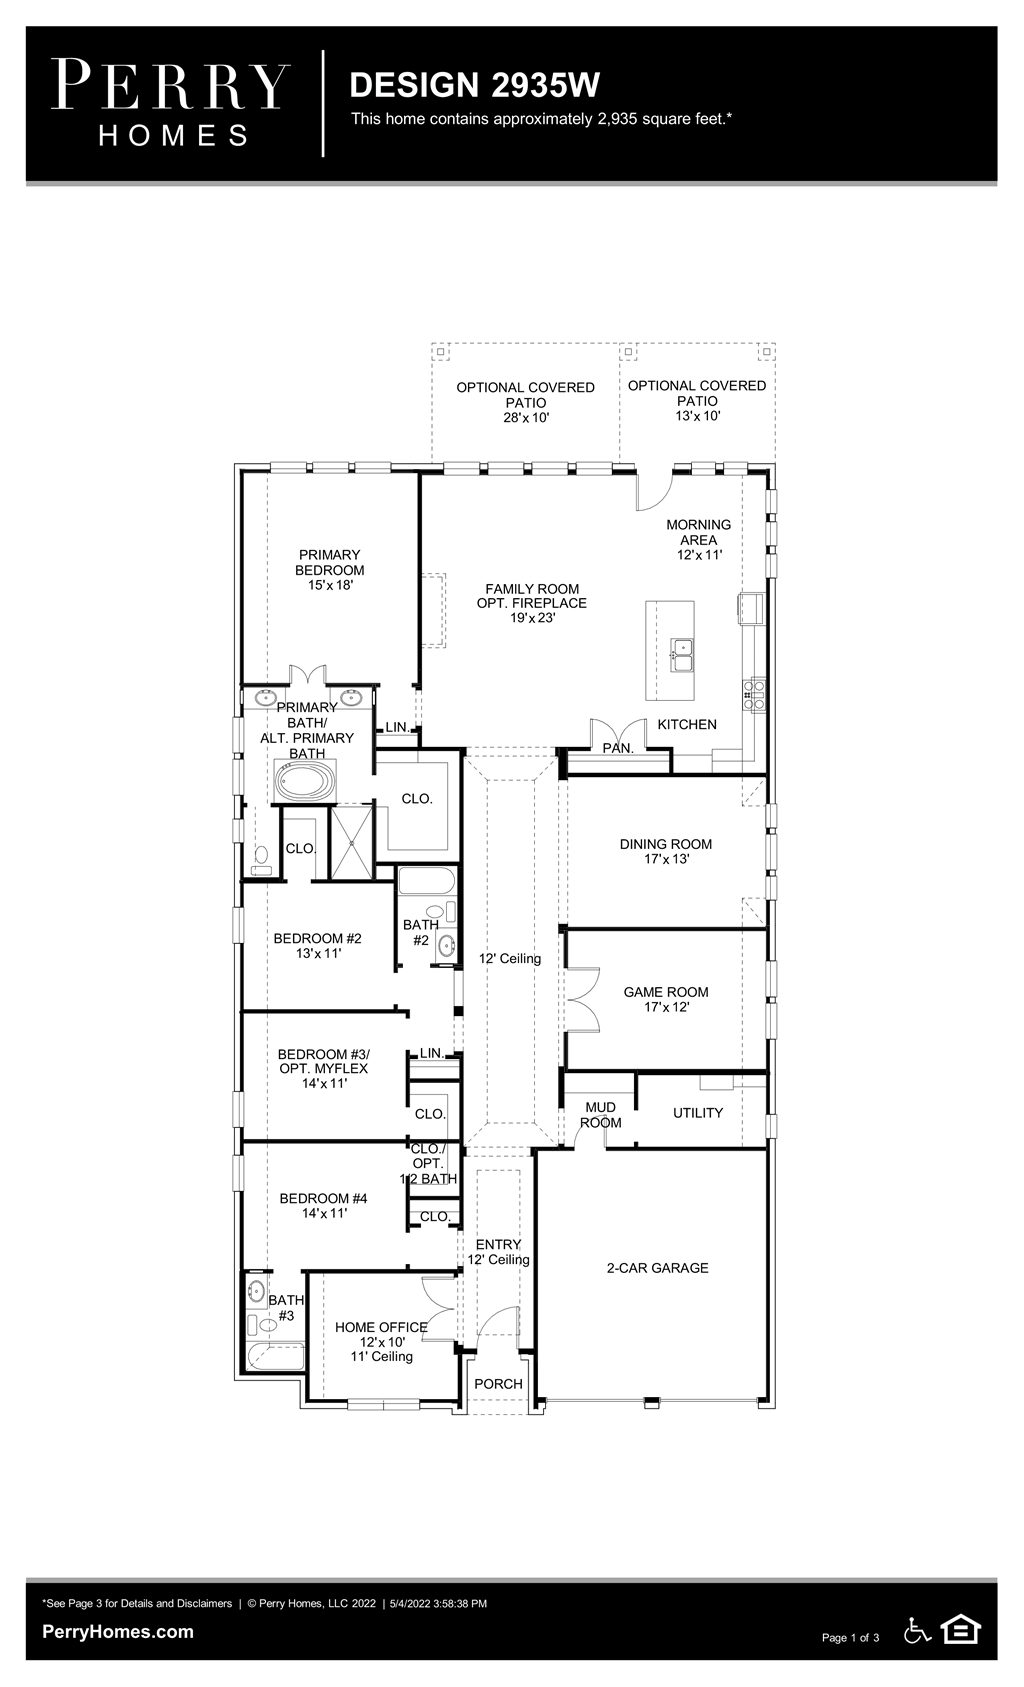 Floor Plan for 2935W